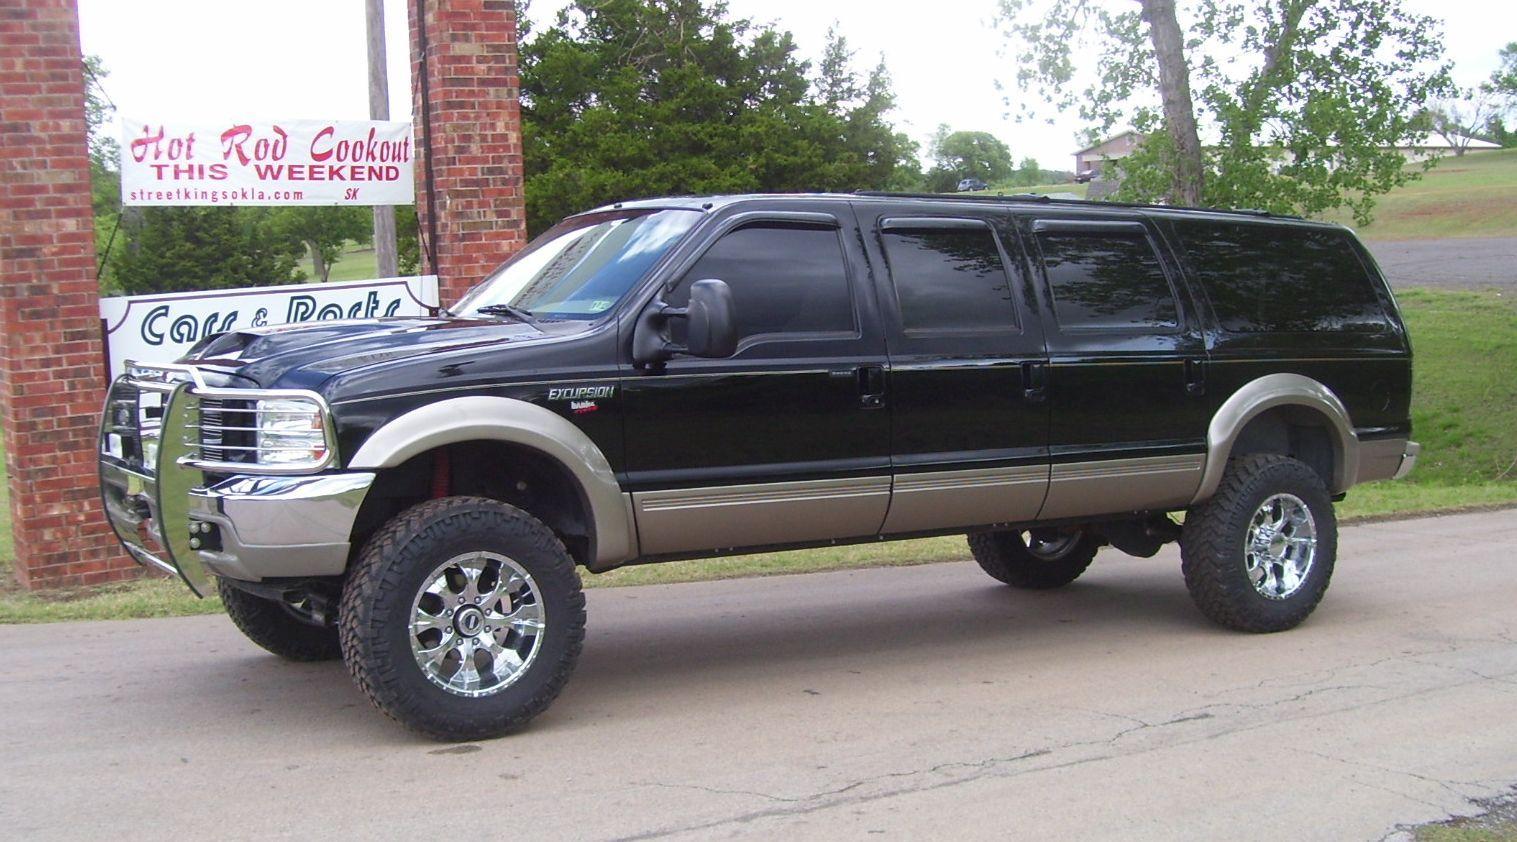 Six Door Excursion & Six Door Excursion | Vehicles | Pinterest | Vehicle Tractor and Cars